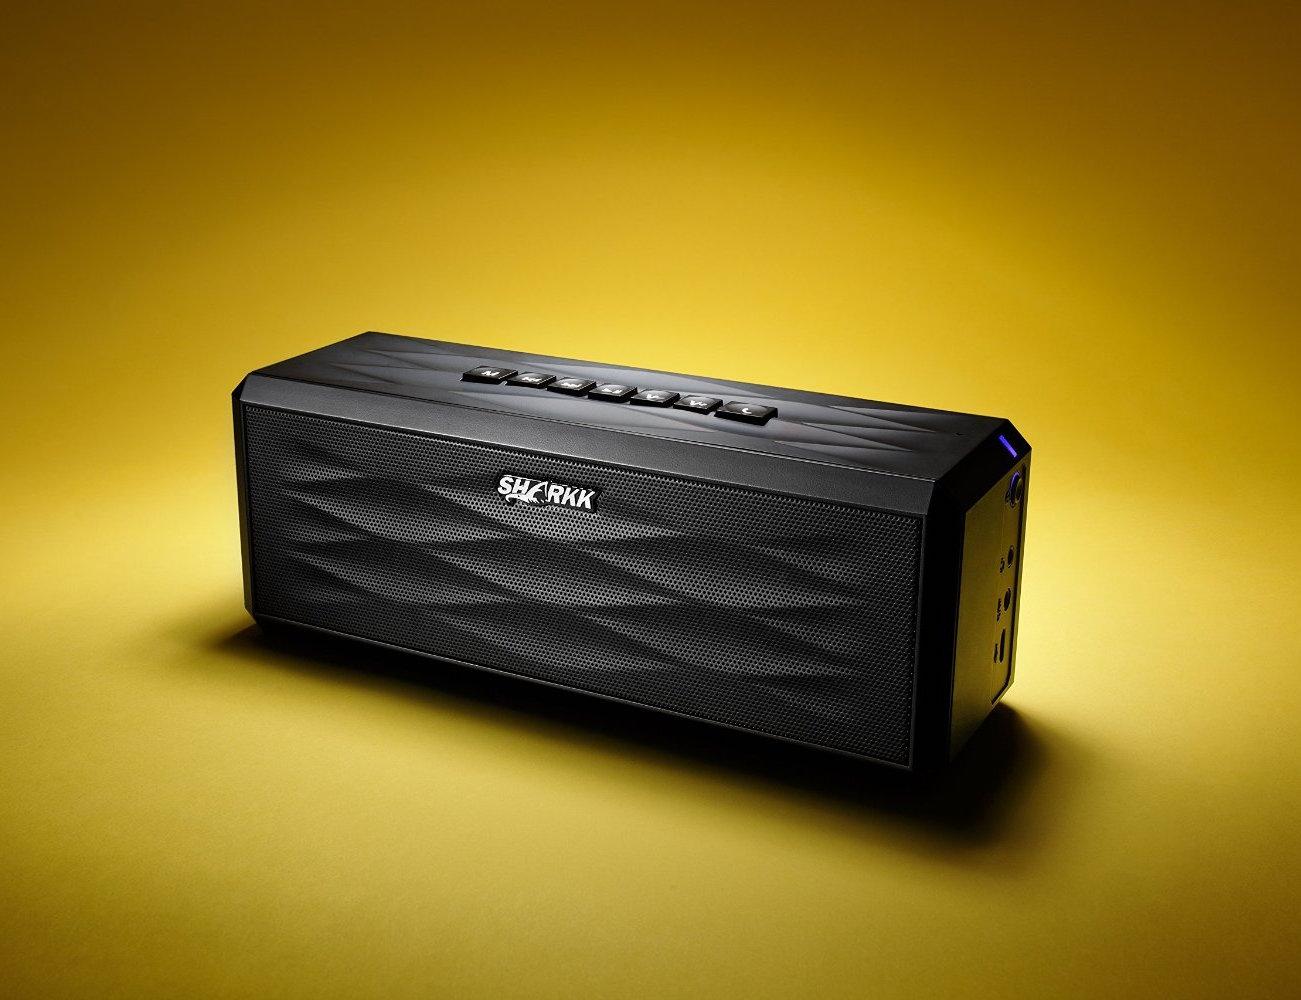 SHARKK Boombox Portable Bluetooth Speaker